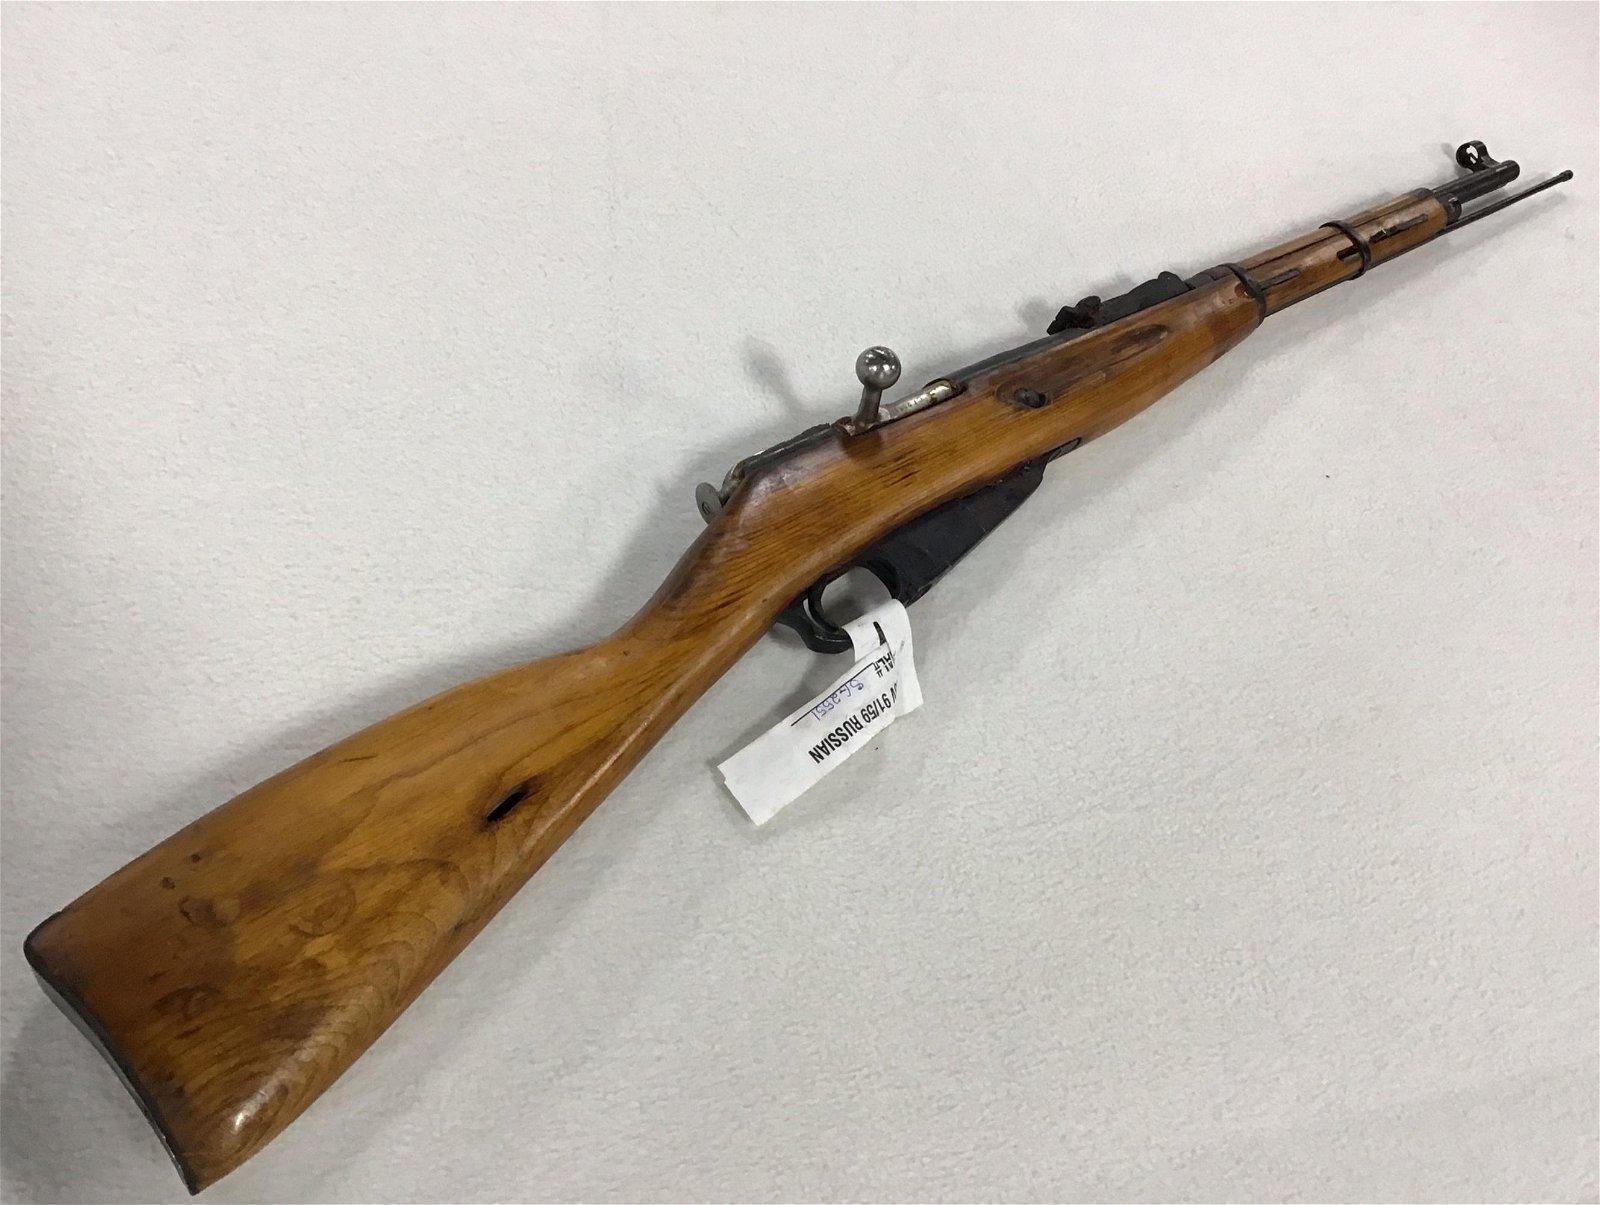 1943 Russian Nagant Short Rifle7.62x54